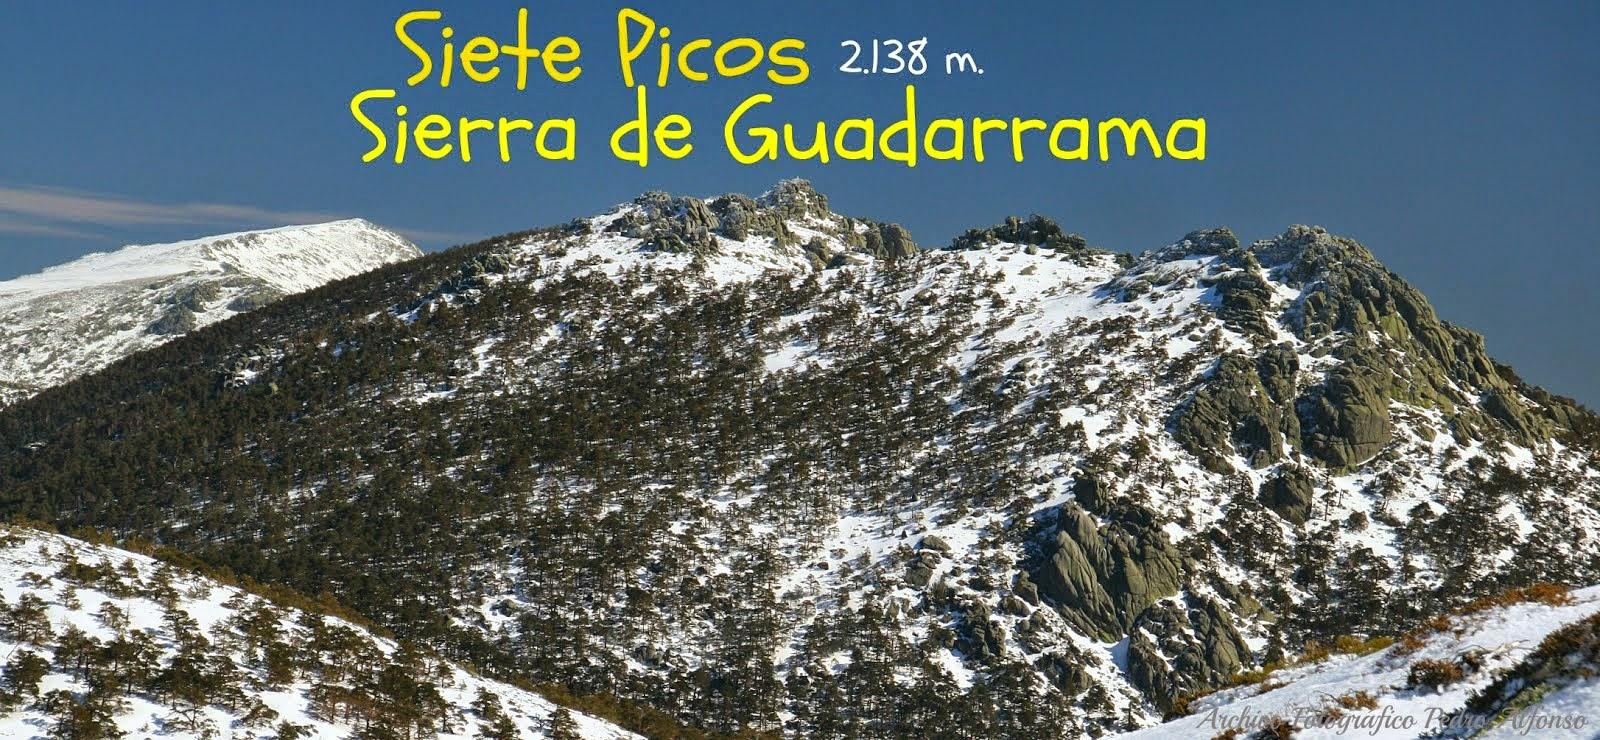 Siete Picos, la Sierra del Dragón